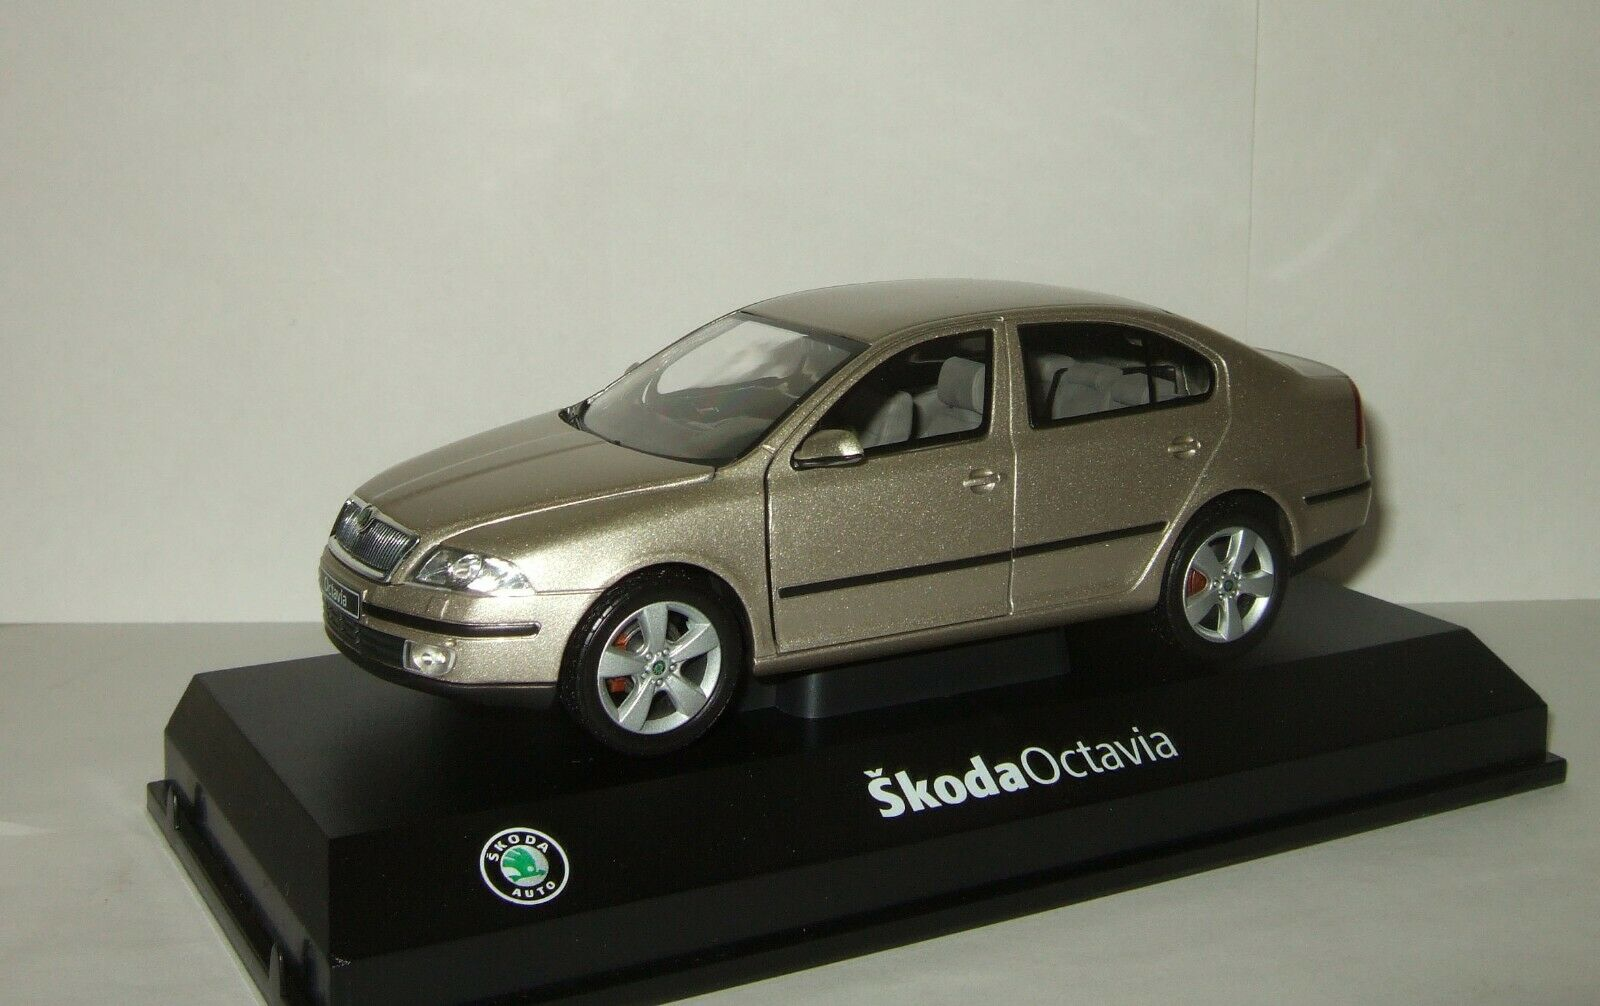 1 24 Abrex 1 24 Abrex Skoda Octavia II 2005